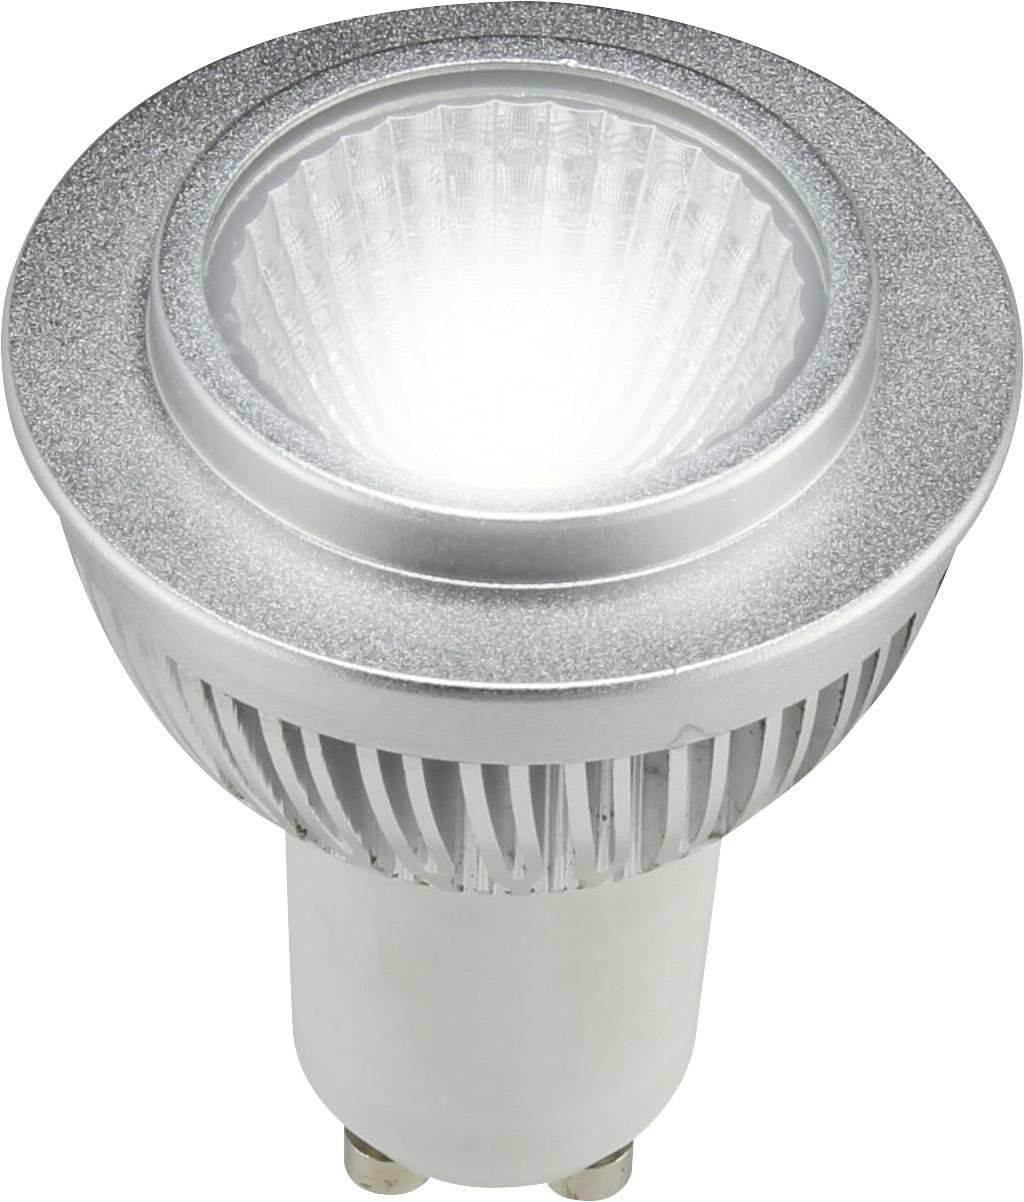 LED Sygonix 230 V, GU10, 4 W = 25 W, 64.50 mm, studená bílá, A+, reflektor 1 ks